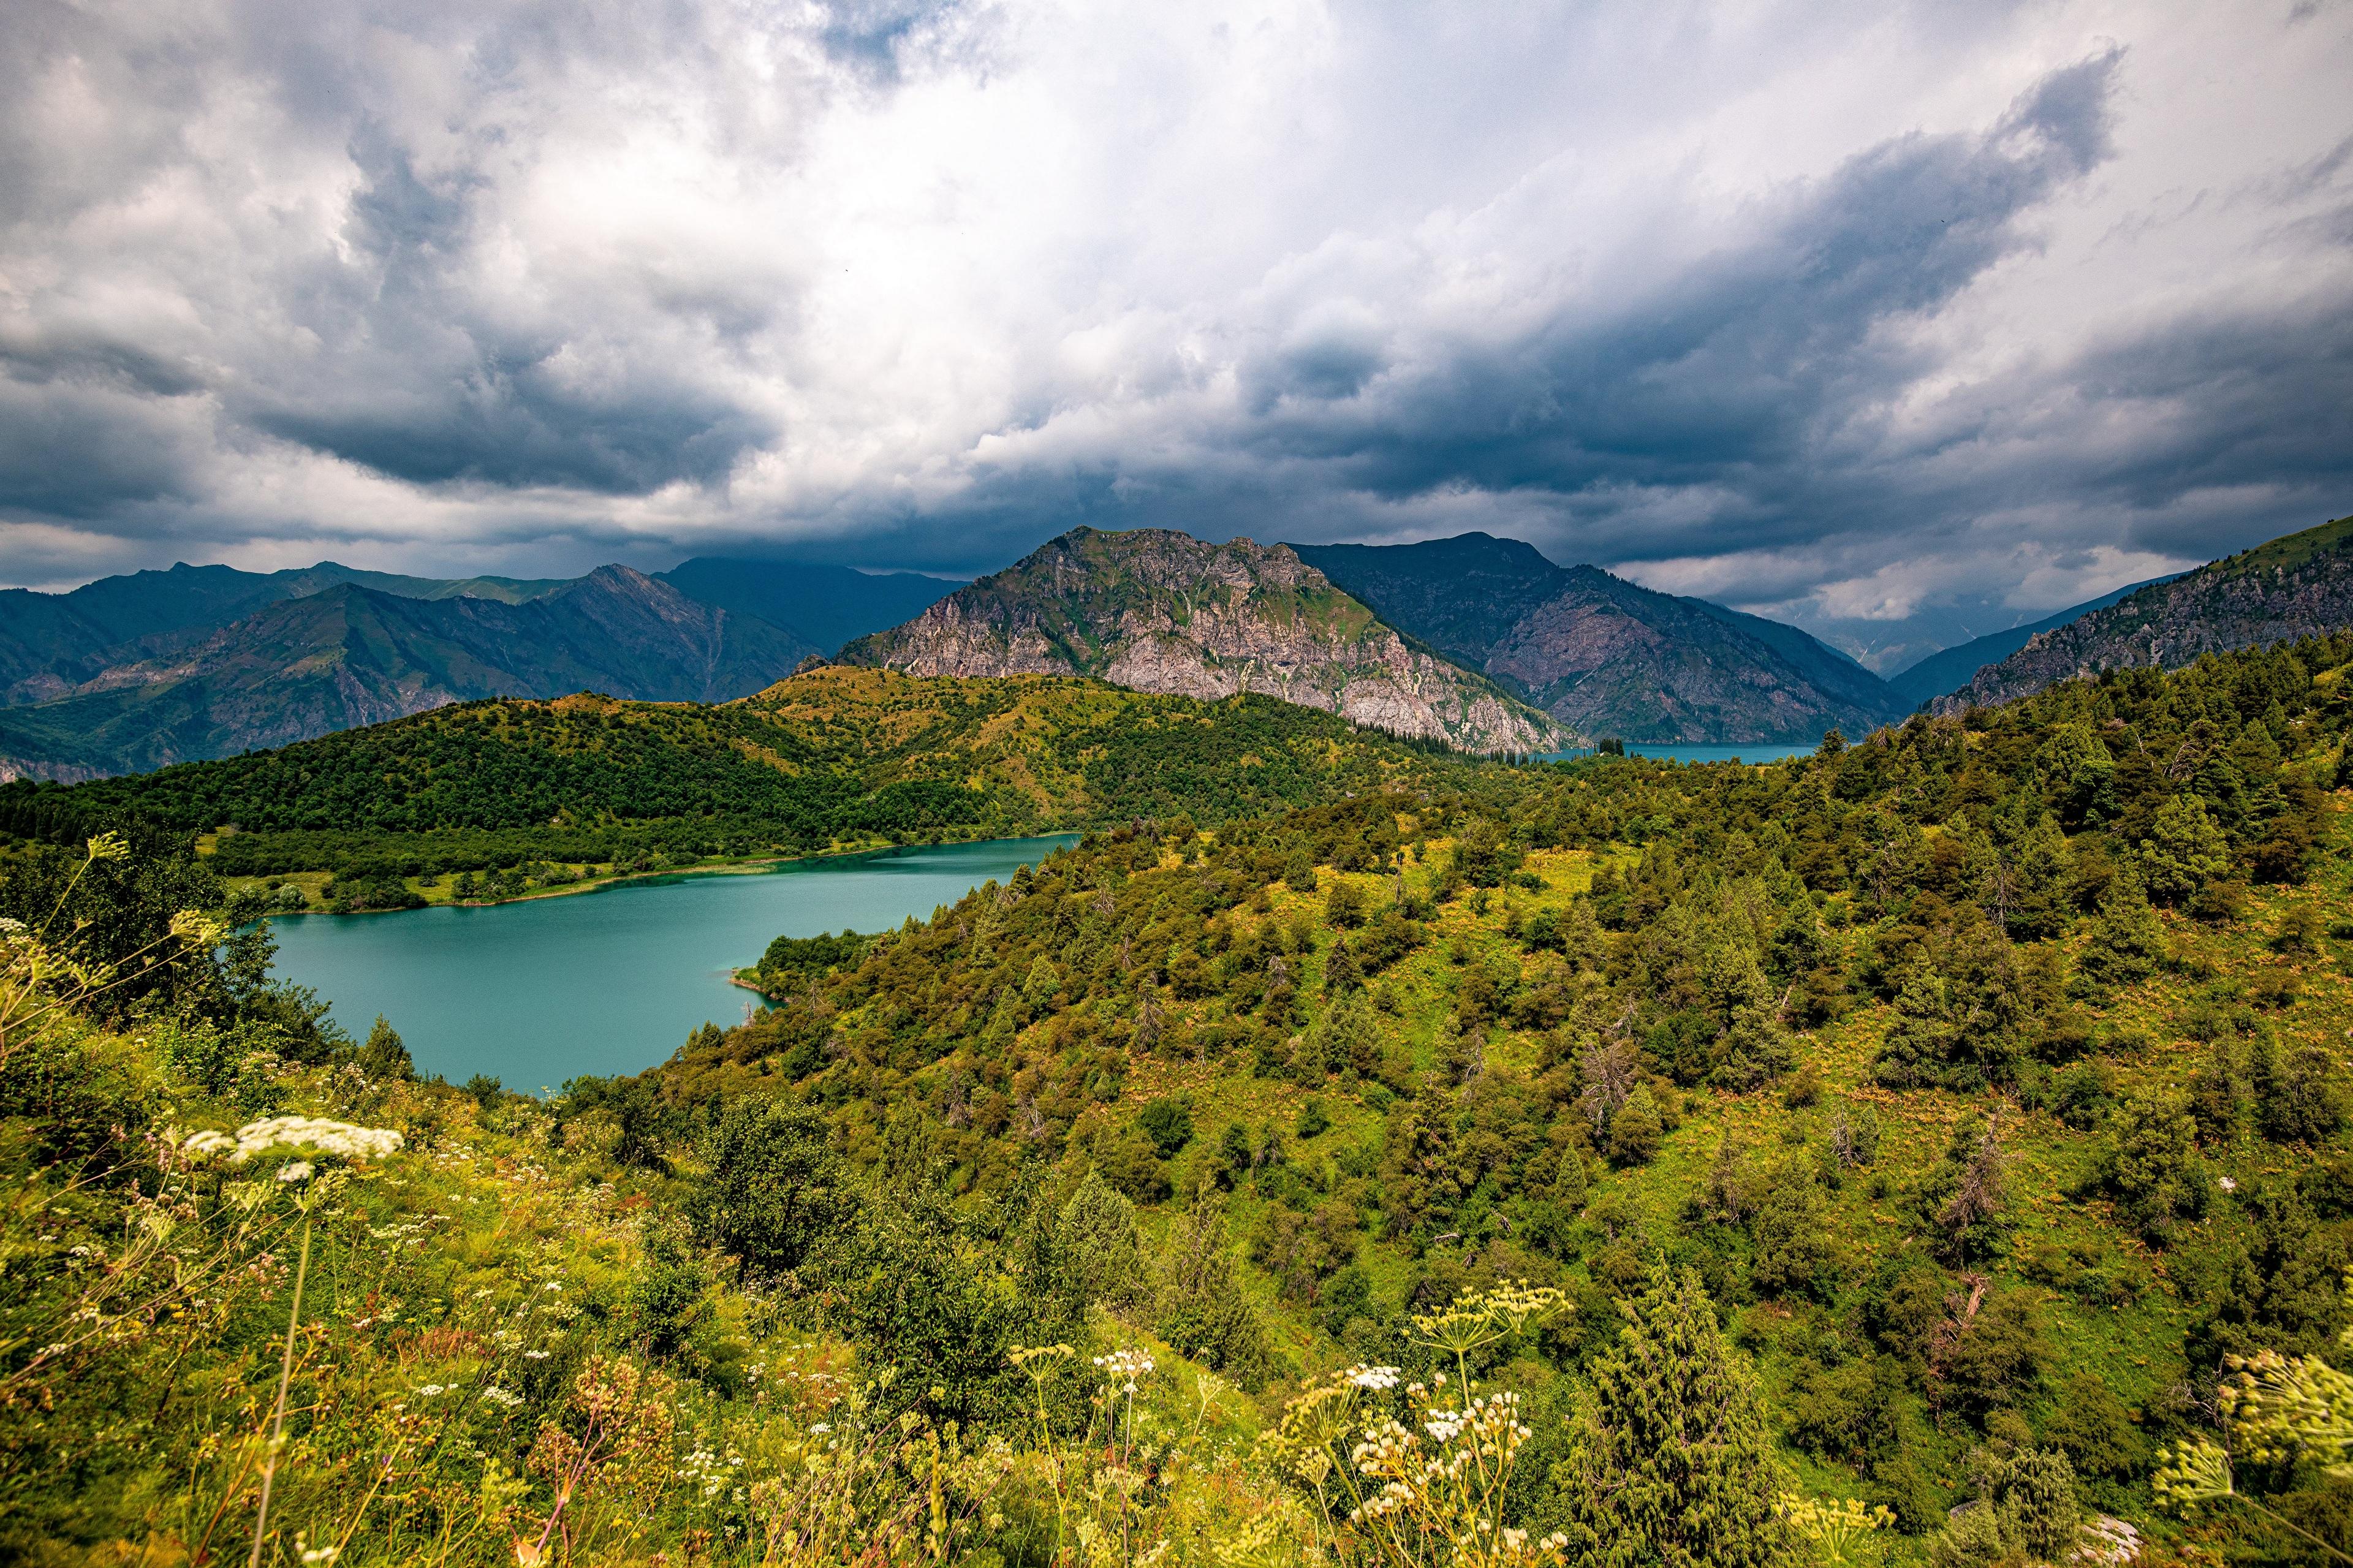 Картинки Sary-Chelek Lake, Kyrgyzstan гора Природа Озеро облачно 3840x2560 Горы Облака облако